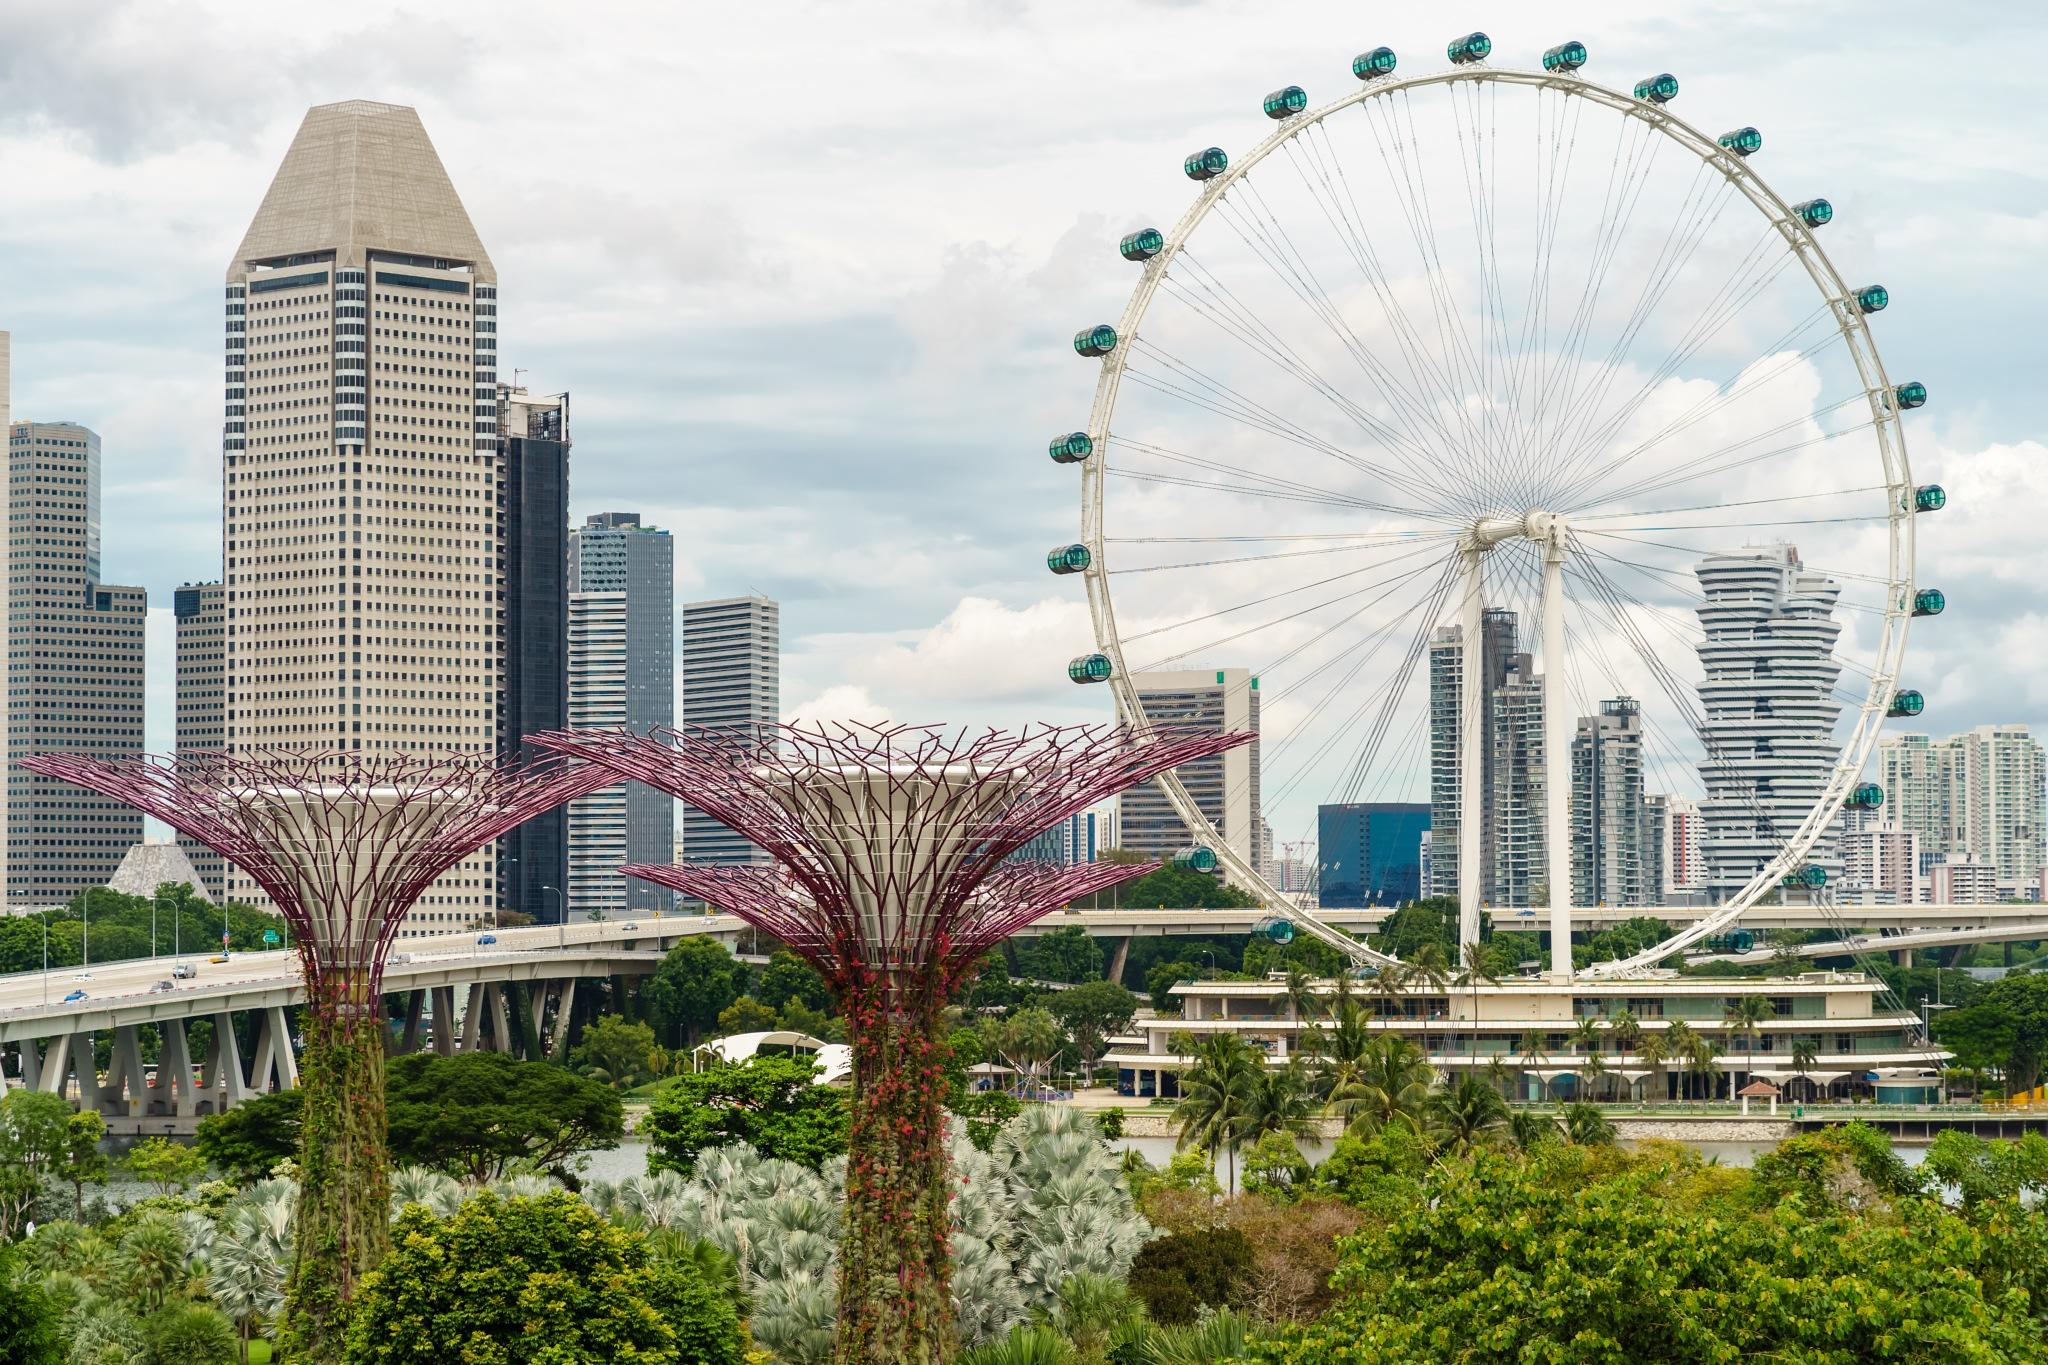 Singapore by Digital Salt